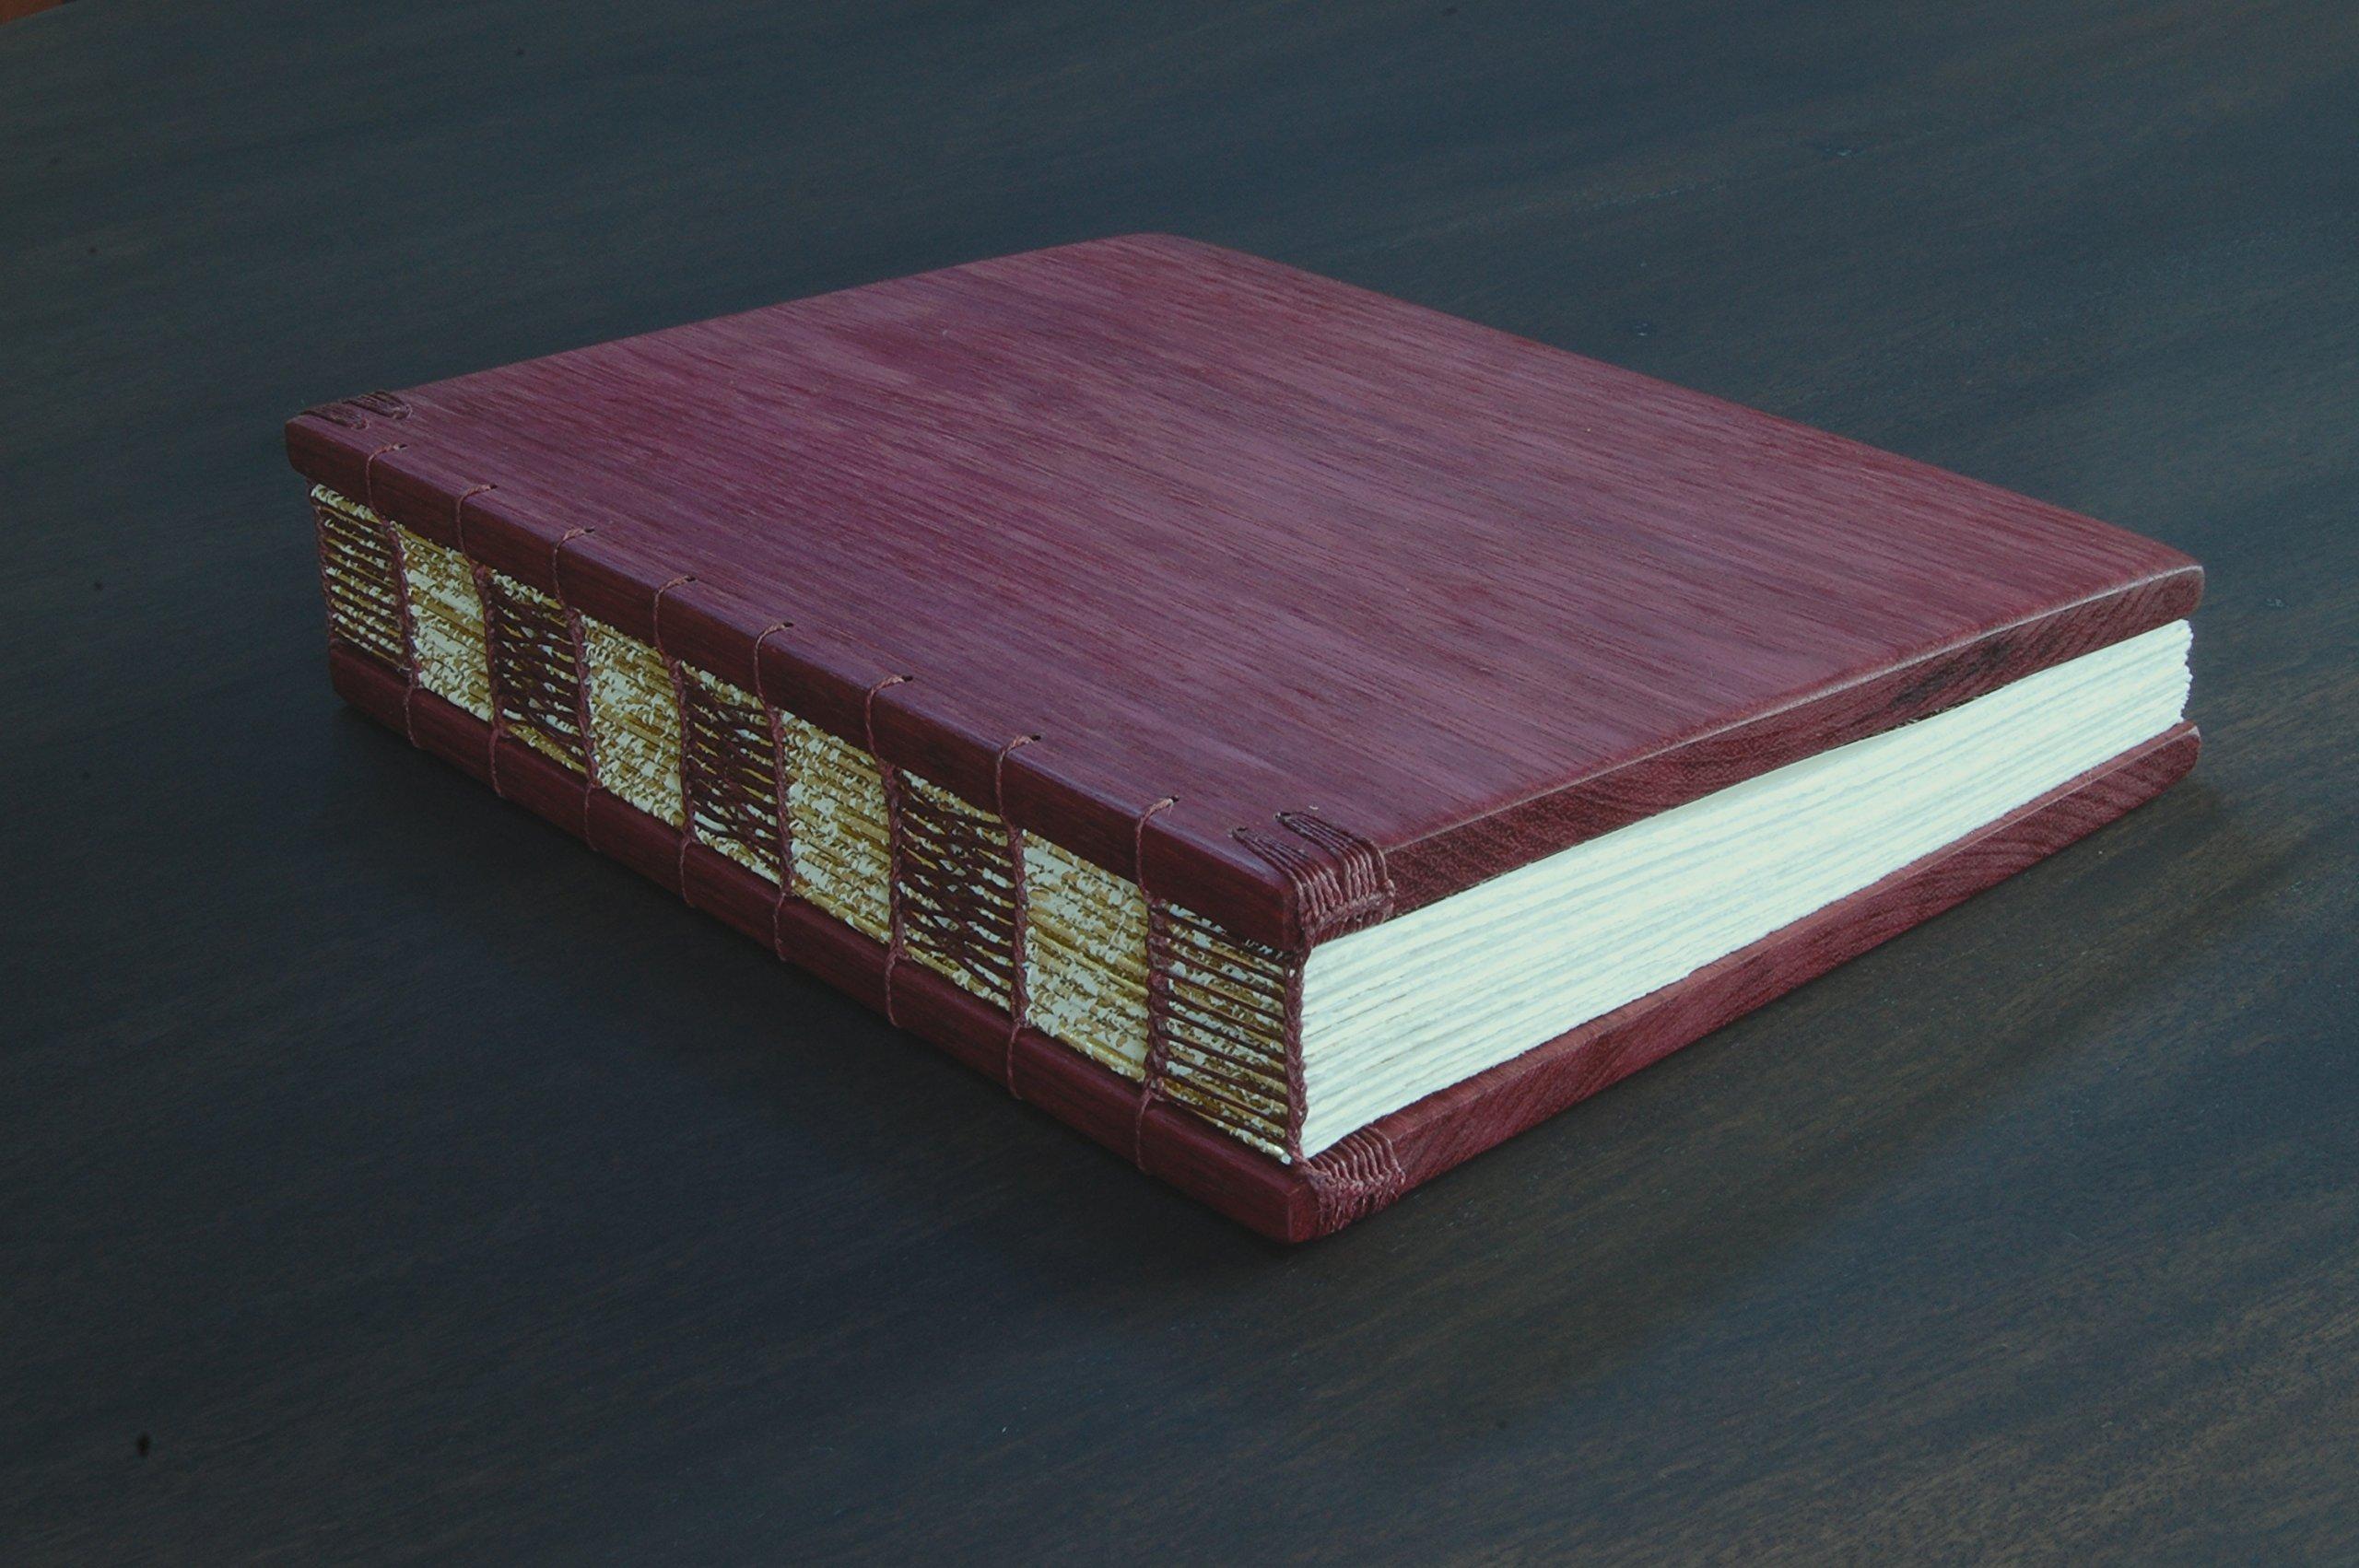 Handmade Purpleheart Wood Wedding Guest Book or Journal